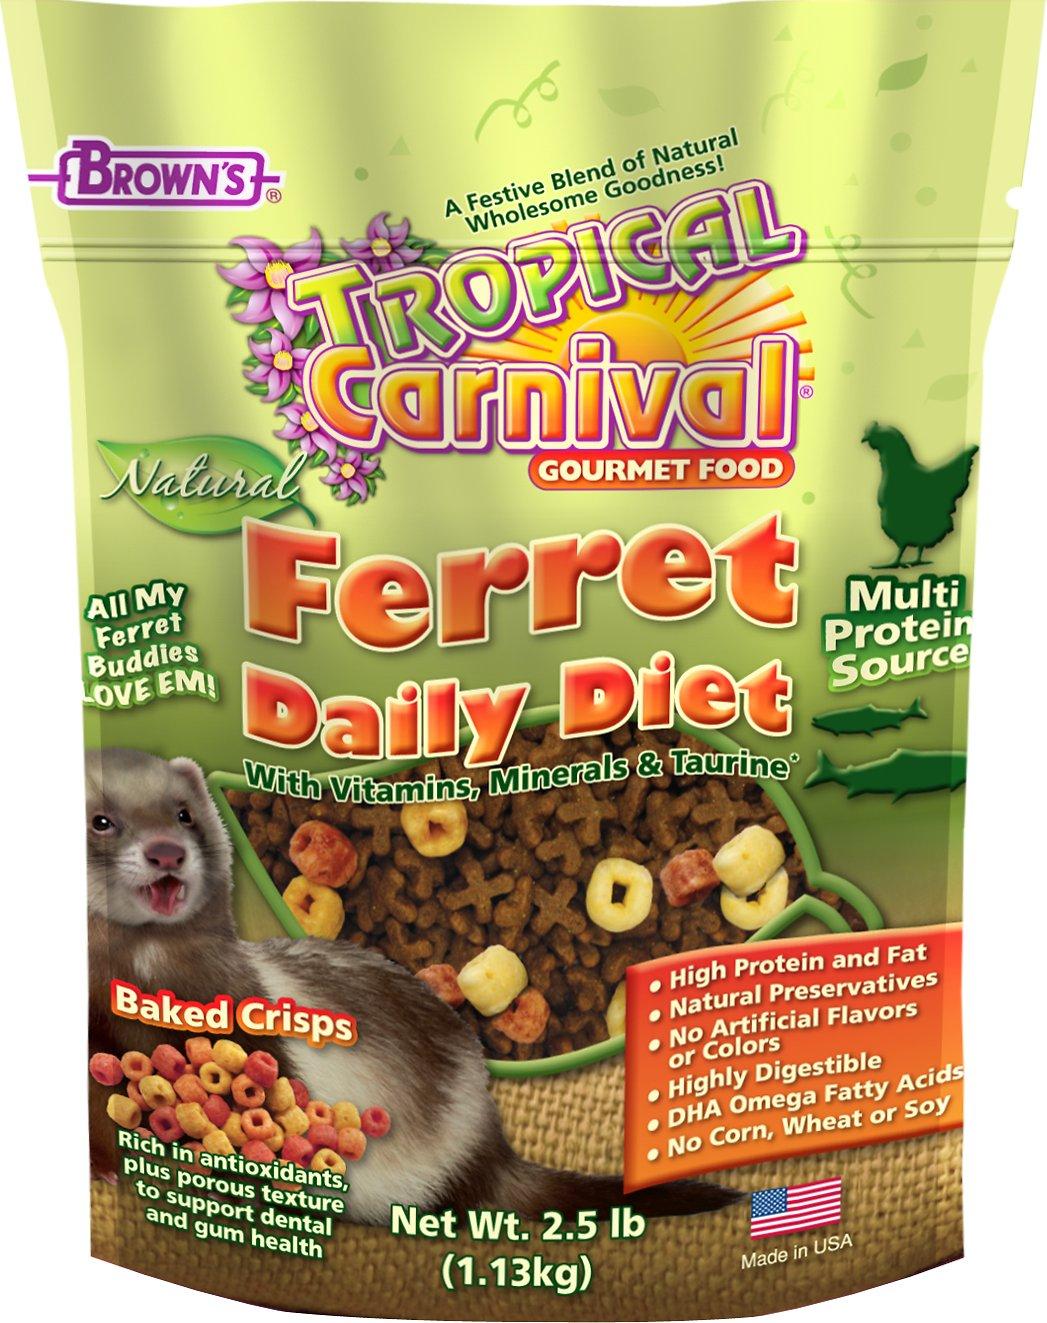 Brown's Tropical Carnival Natural Daily Diet Ferret Food, 2.5-lb bag